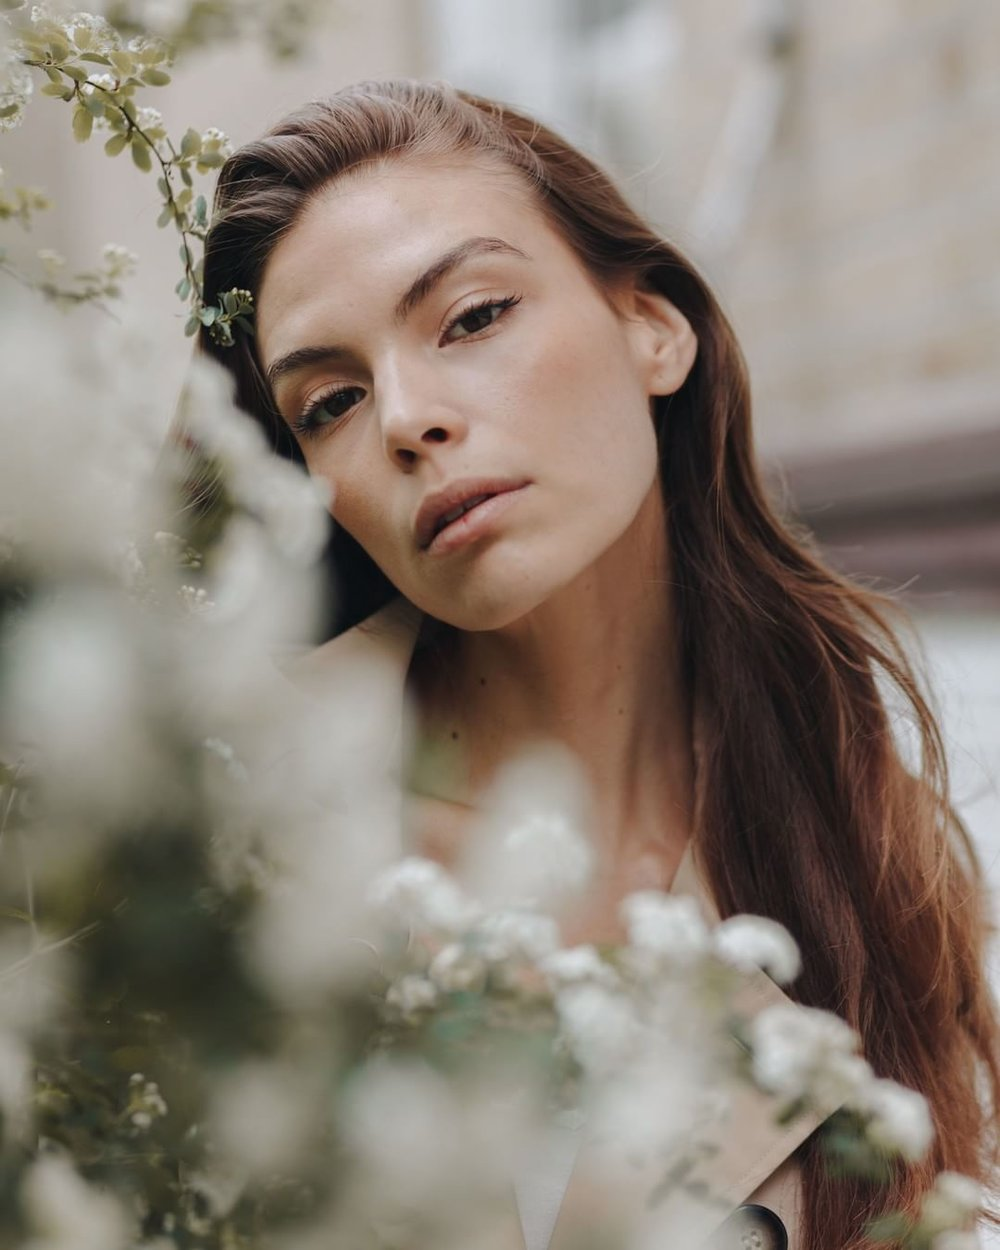 Celilo Miles, Brooklyn portrait photography by Megan Breukelman